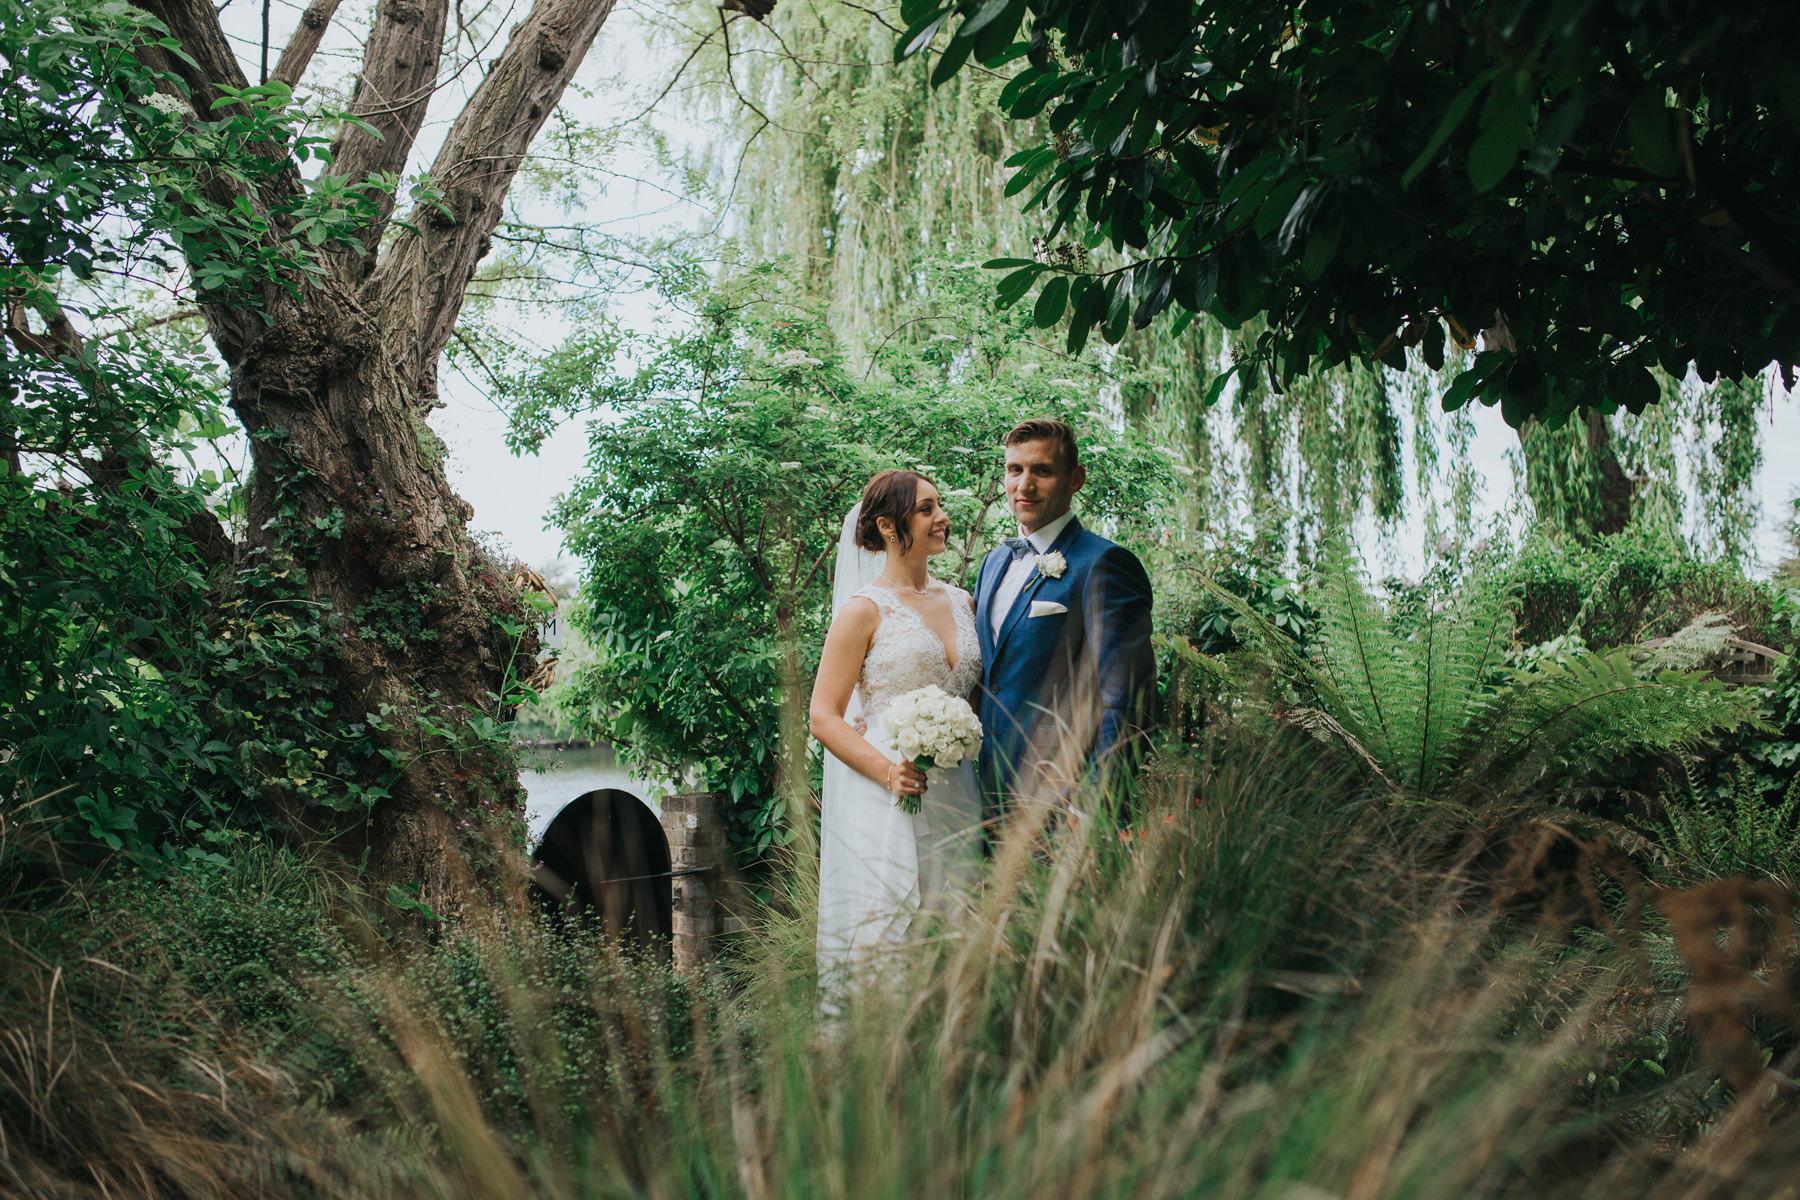 CRL-332-The Bingham wedding Richmond-Claire Rob bridal couple portraits.jpg